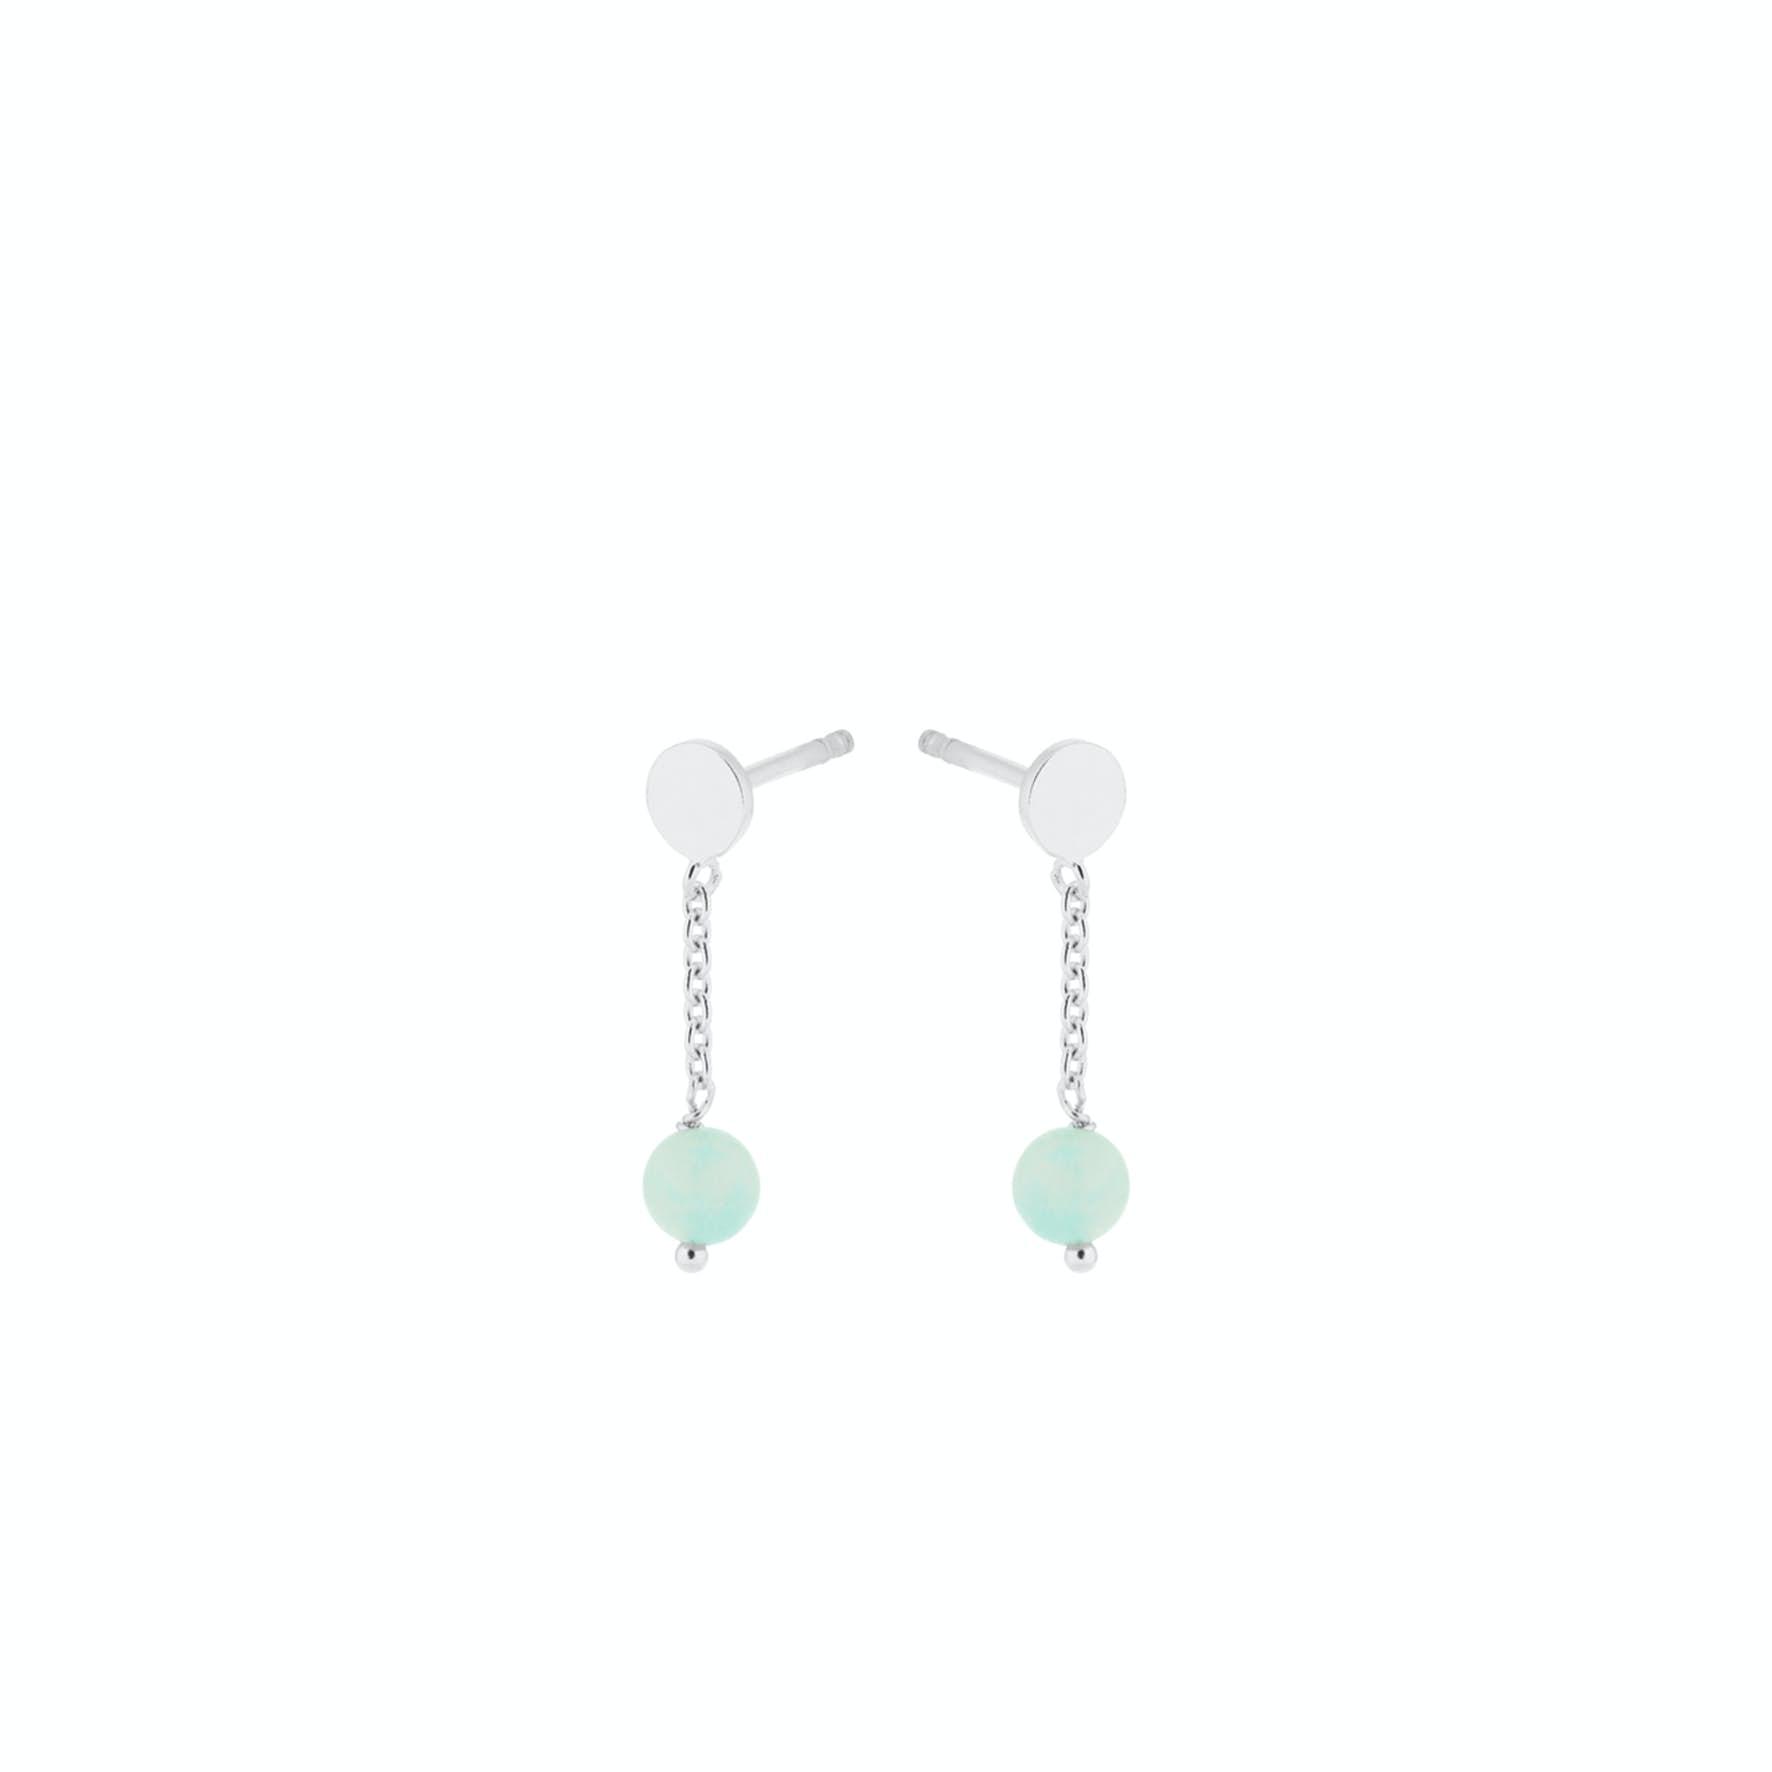 Fjord Earsticks from Pernille Corydon in Silver Sterling 925|Amazonite